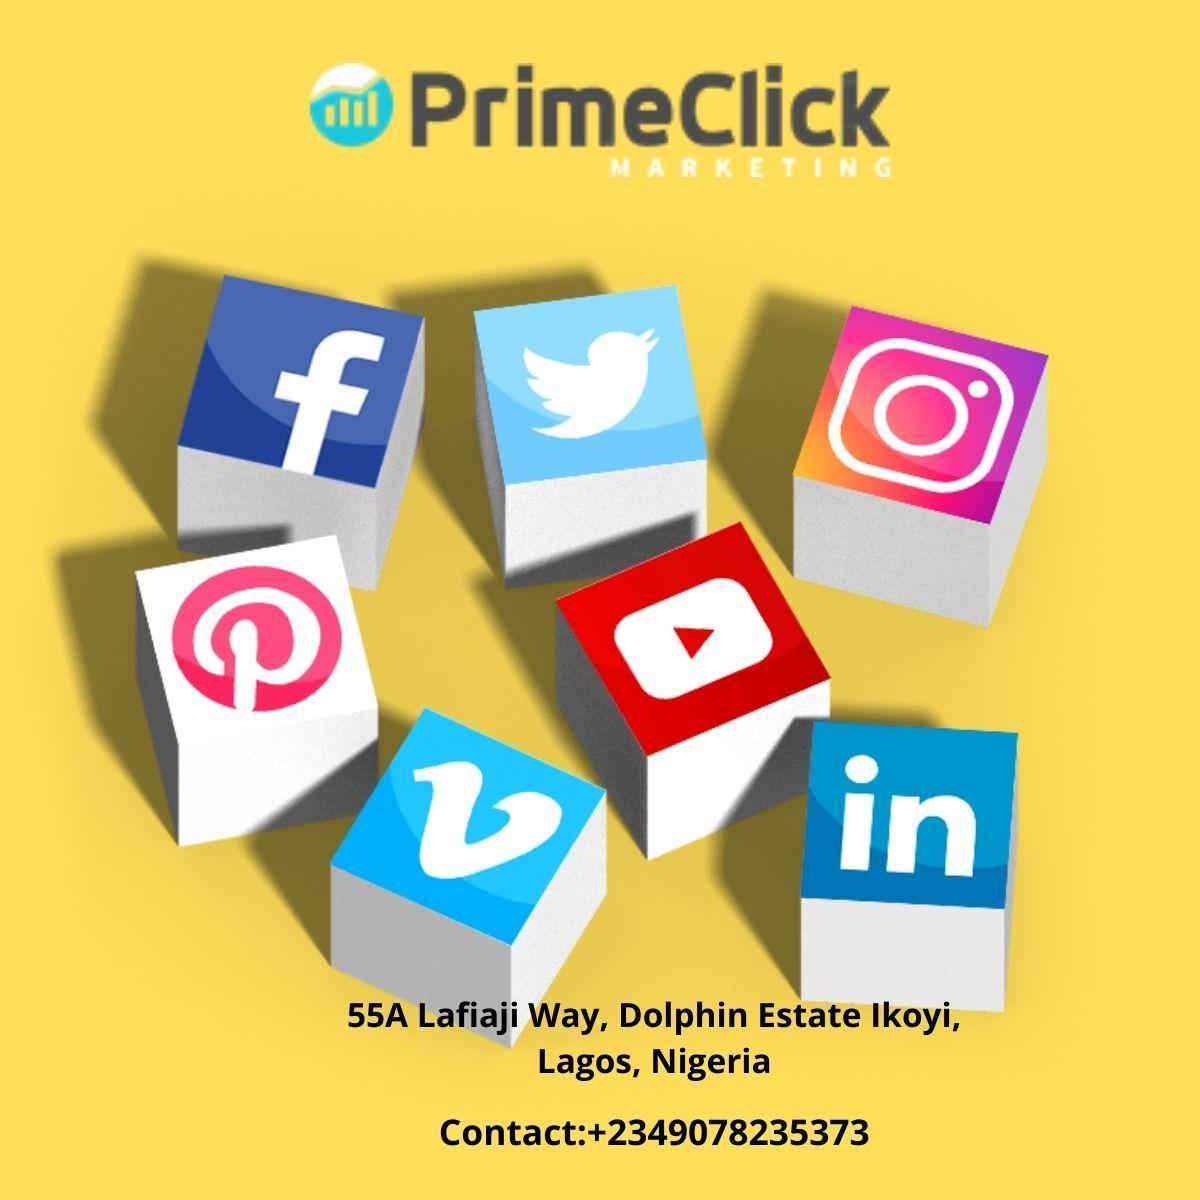 Market your Websites with Digital Marketing